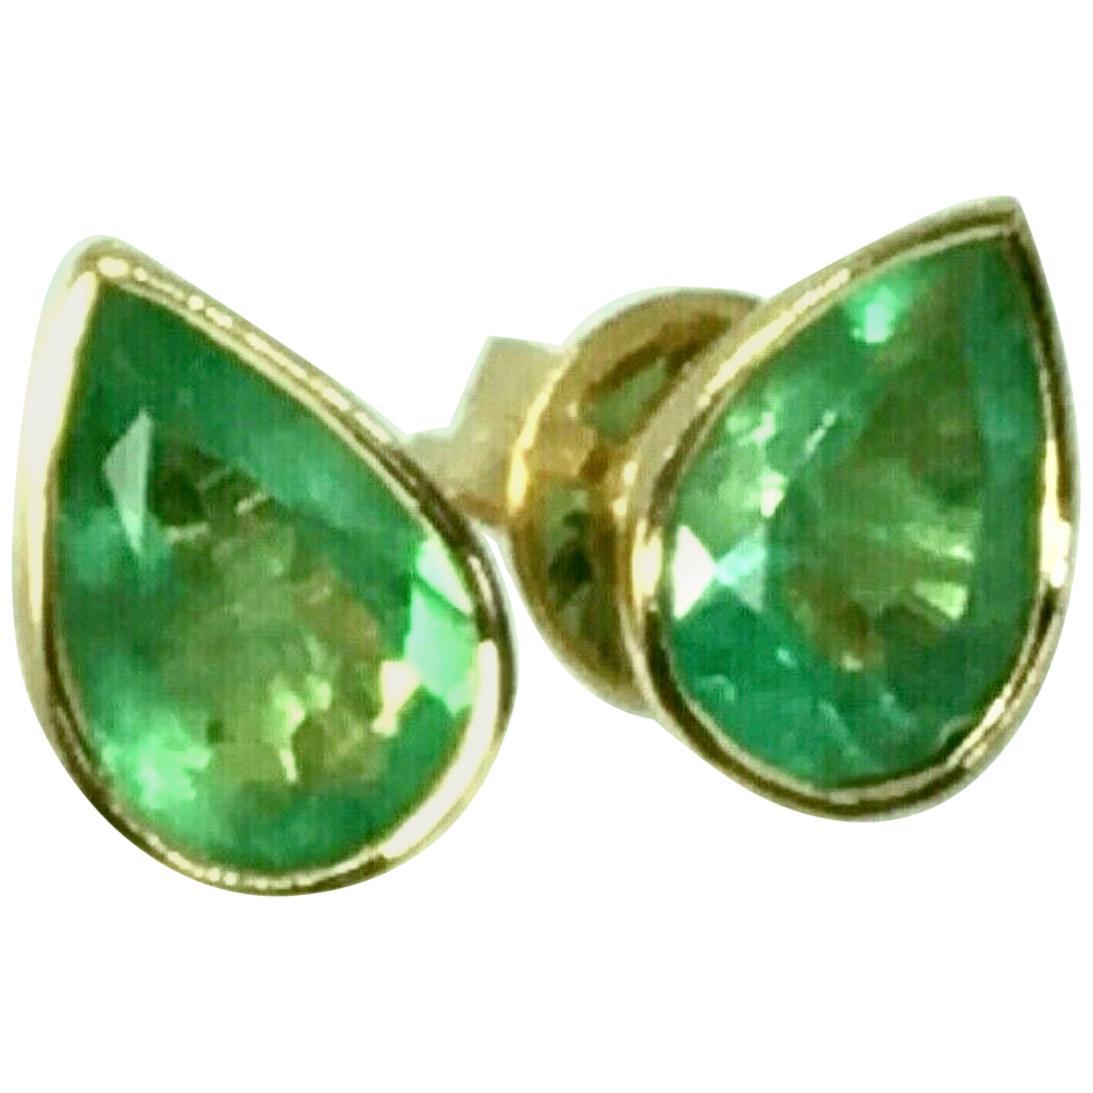 2.50 Carat Pear Cut Colombian Emerald Stud Earrings 18 Karat Yellow Gold